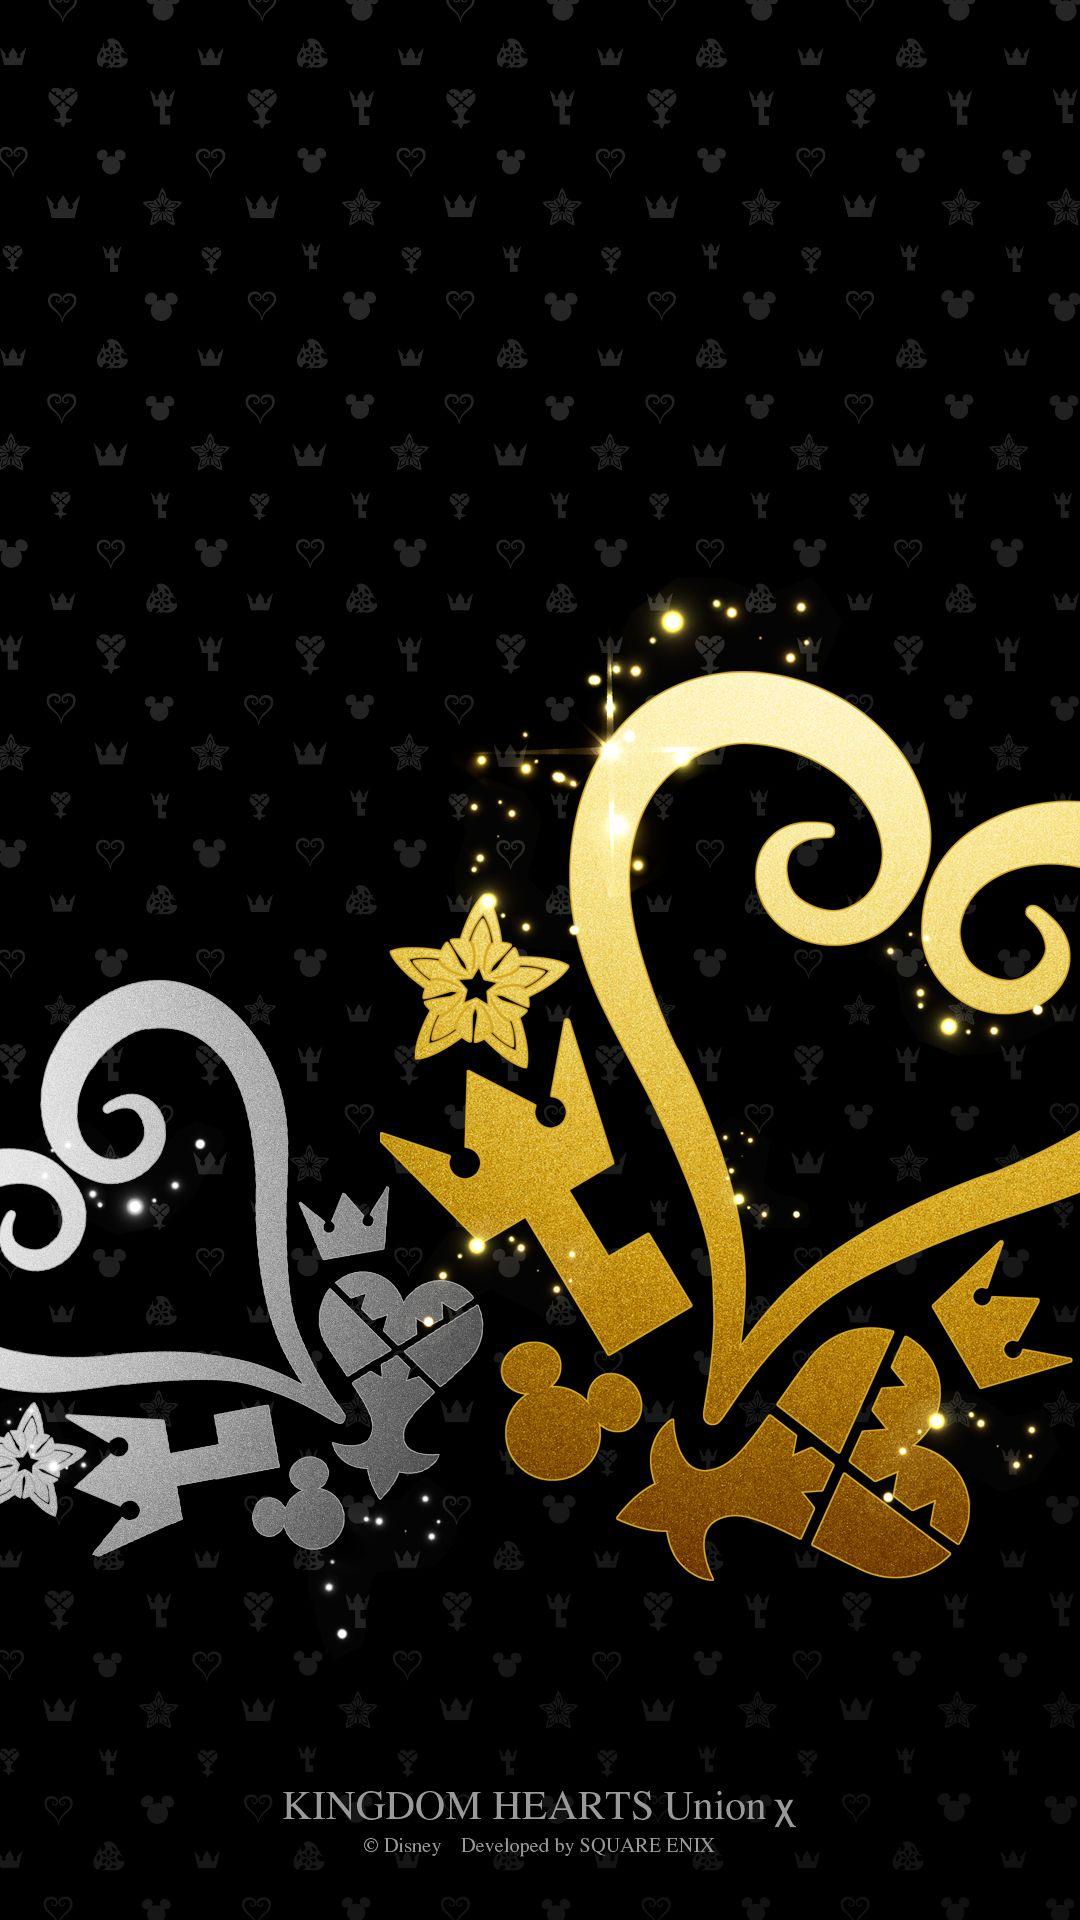 Kingdom Hearts Kingdom hearts wallpaper, Kingdom hearts